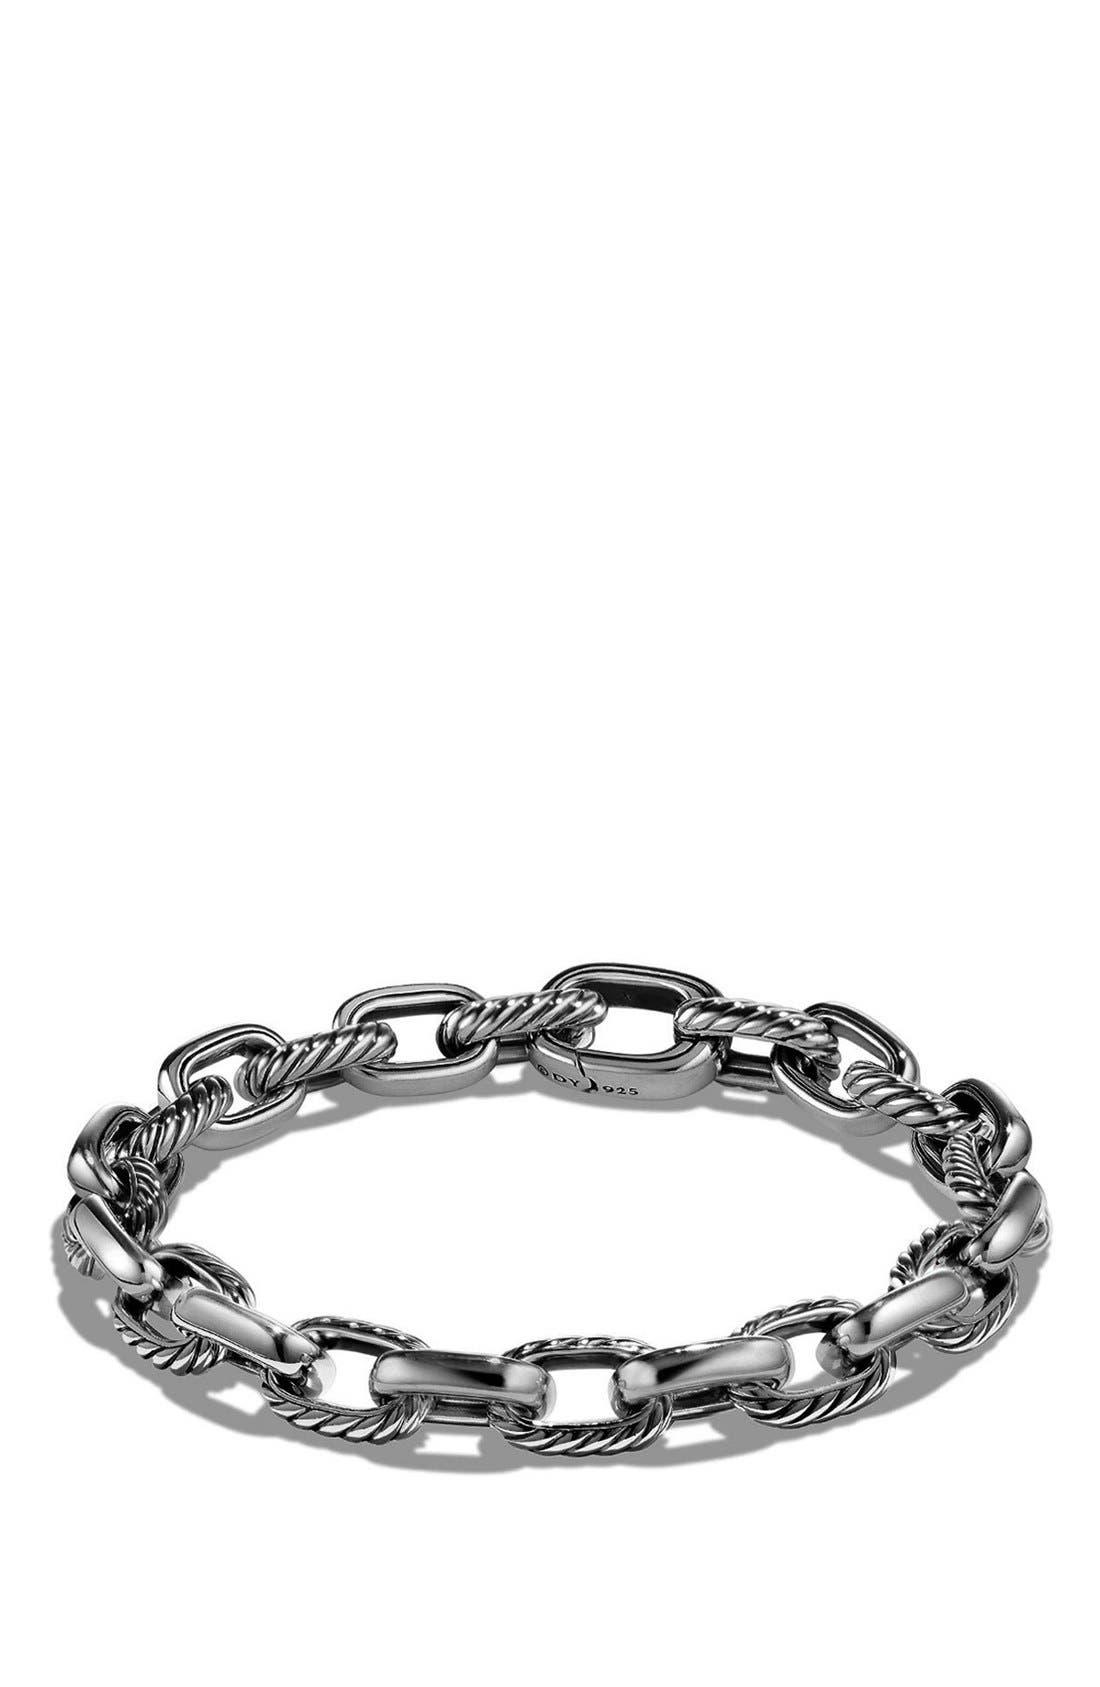 DAVID YURMAN Cable Classics Oval Link Bracelet